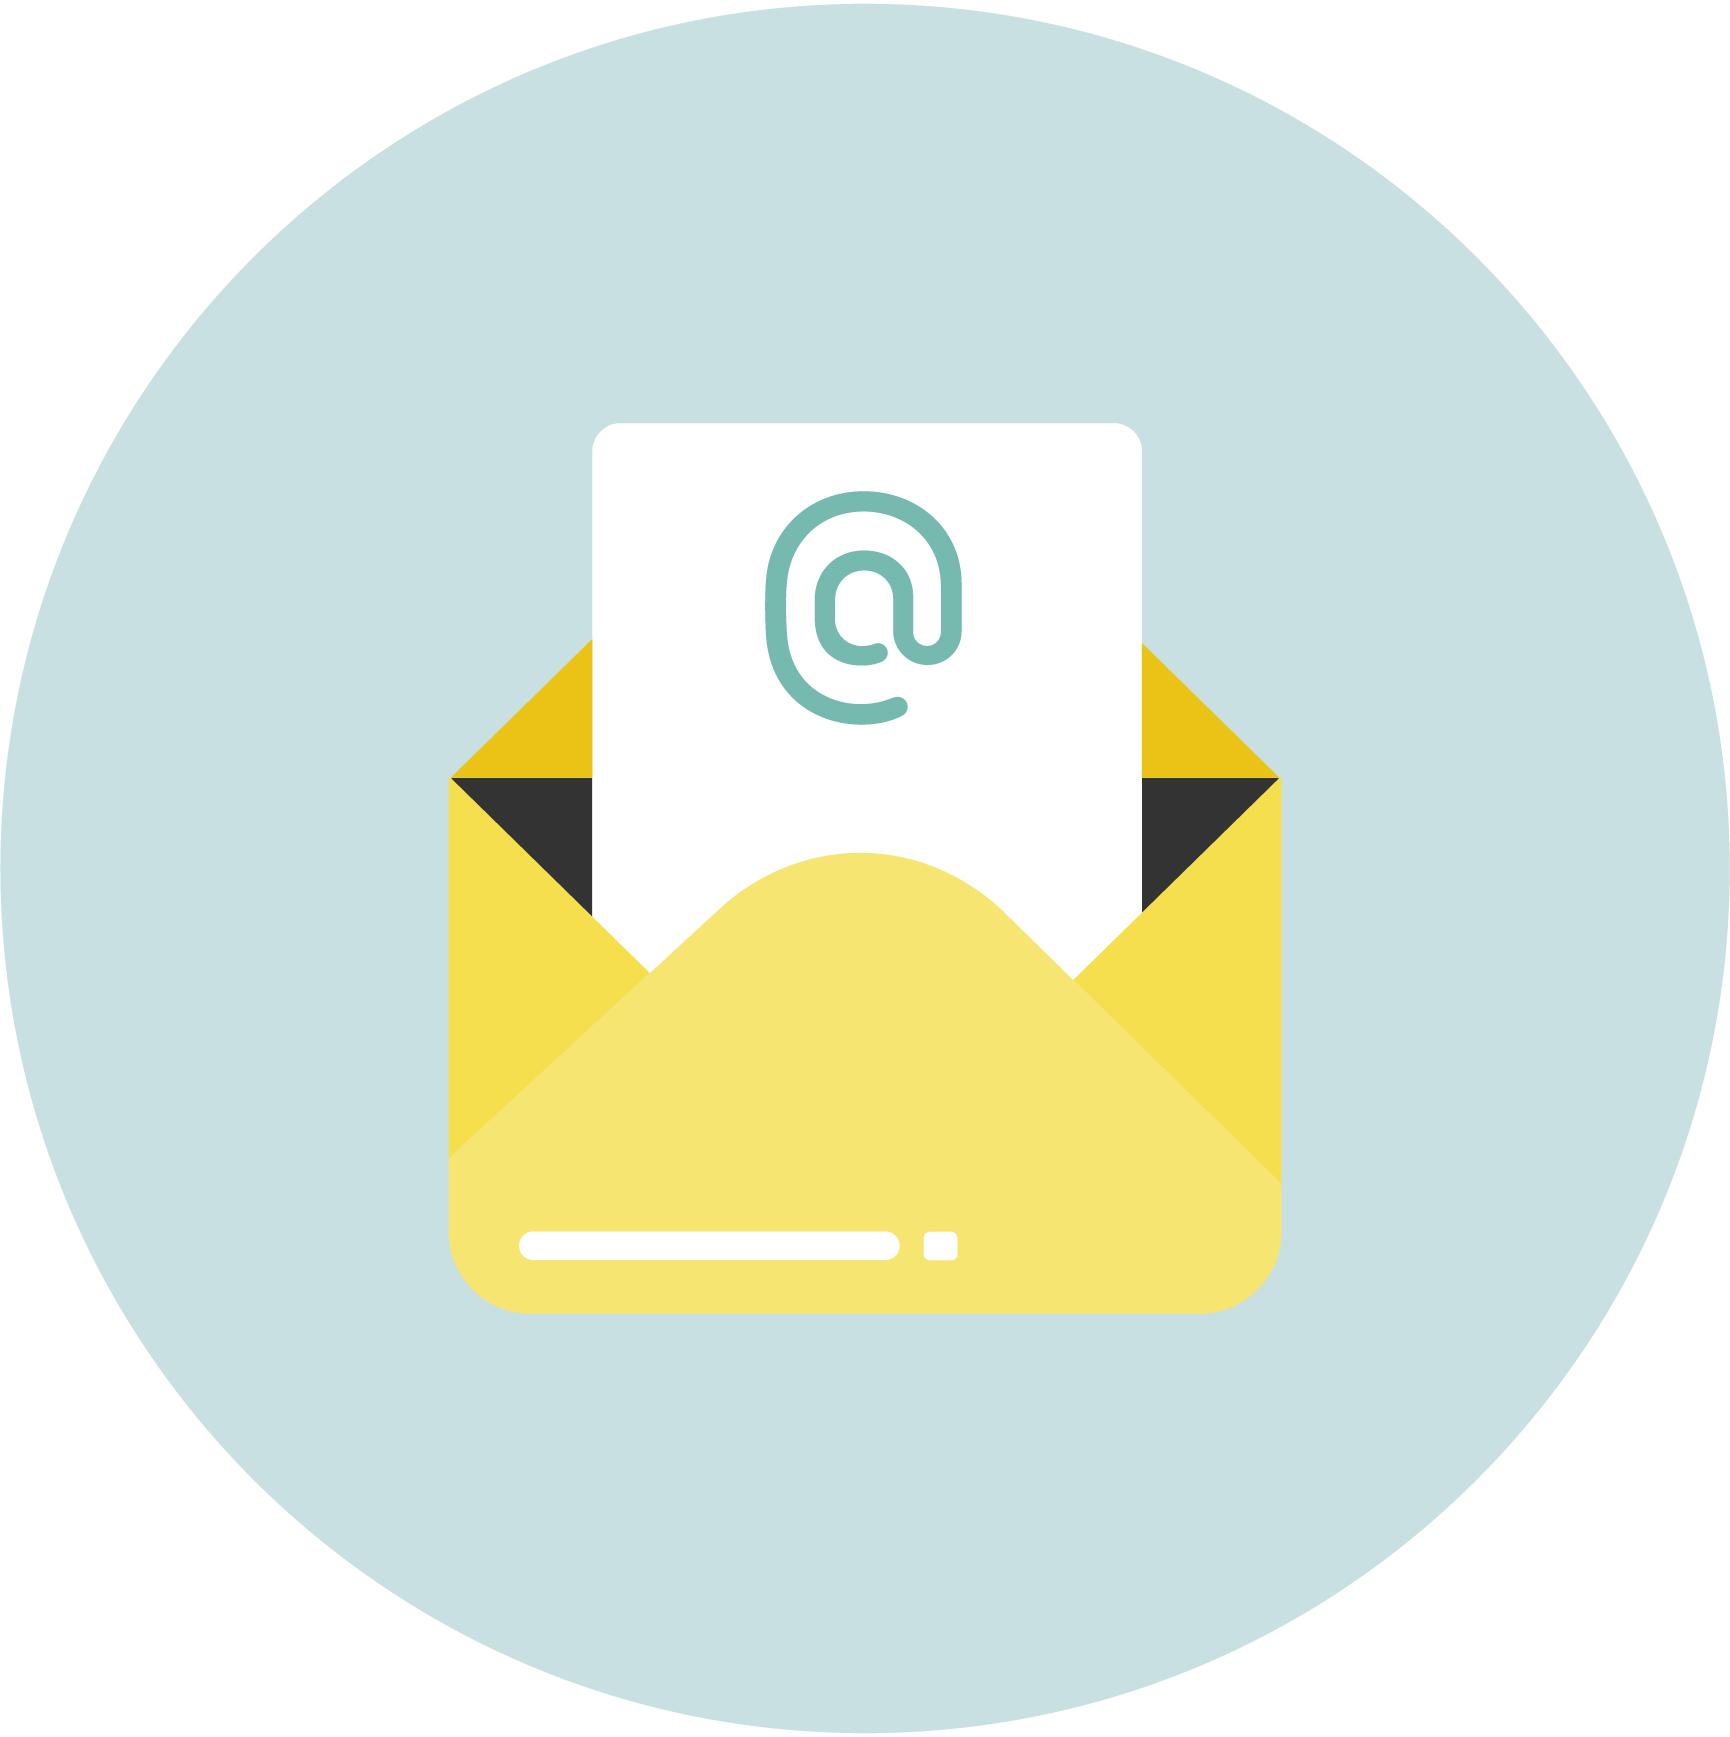 Charte environnementale mail